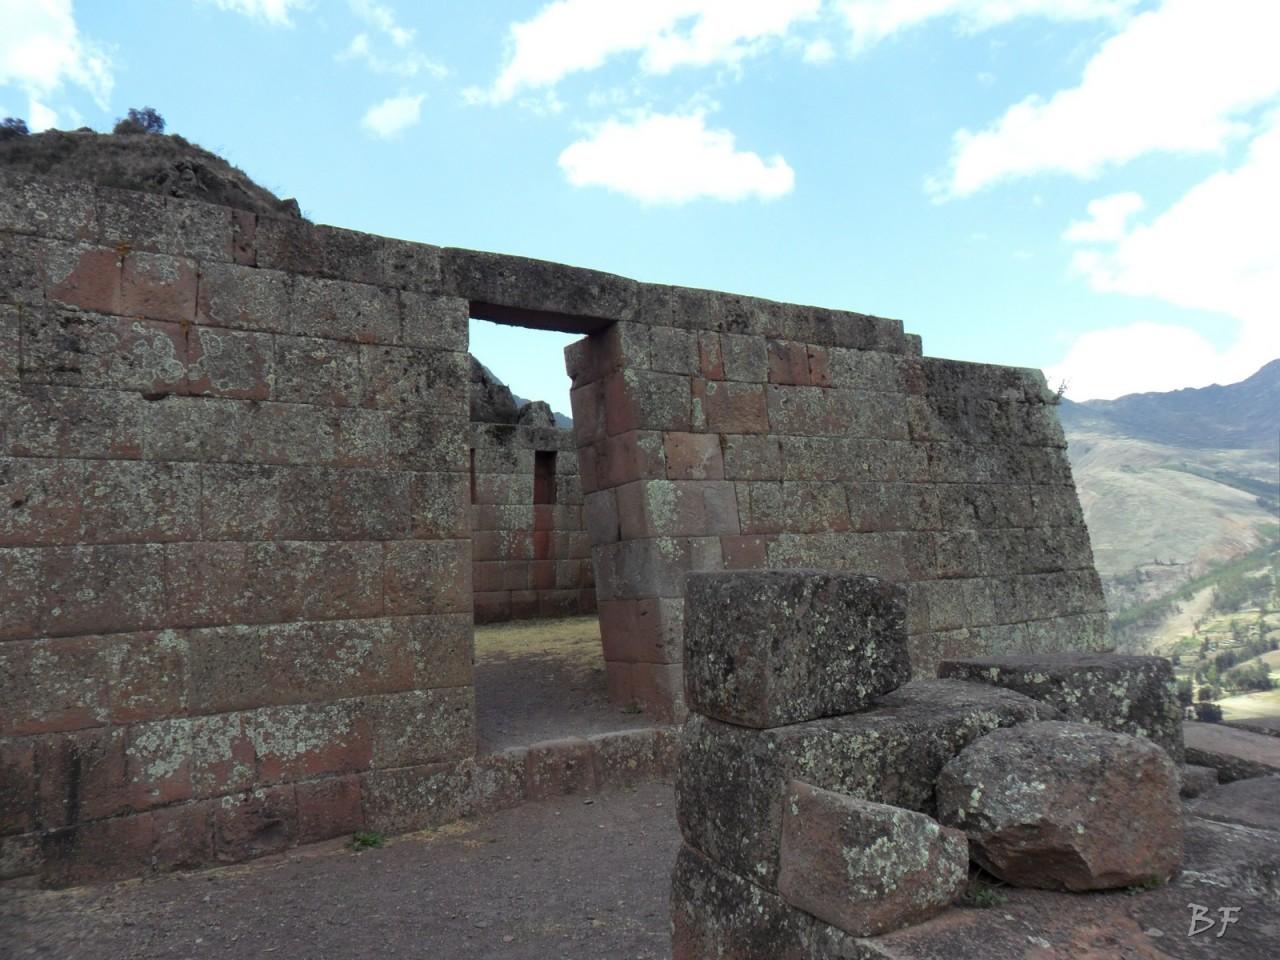 Mura-Poligonali-Megaliti-Altari-Rupestri-Pisac-Cusco-Perù-60